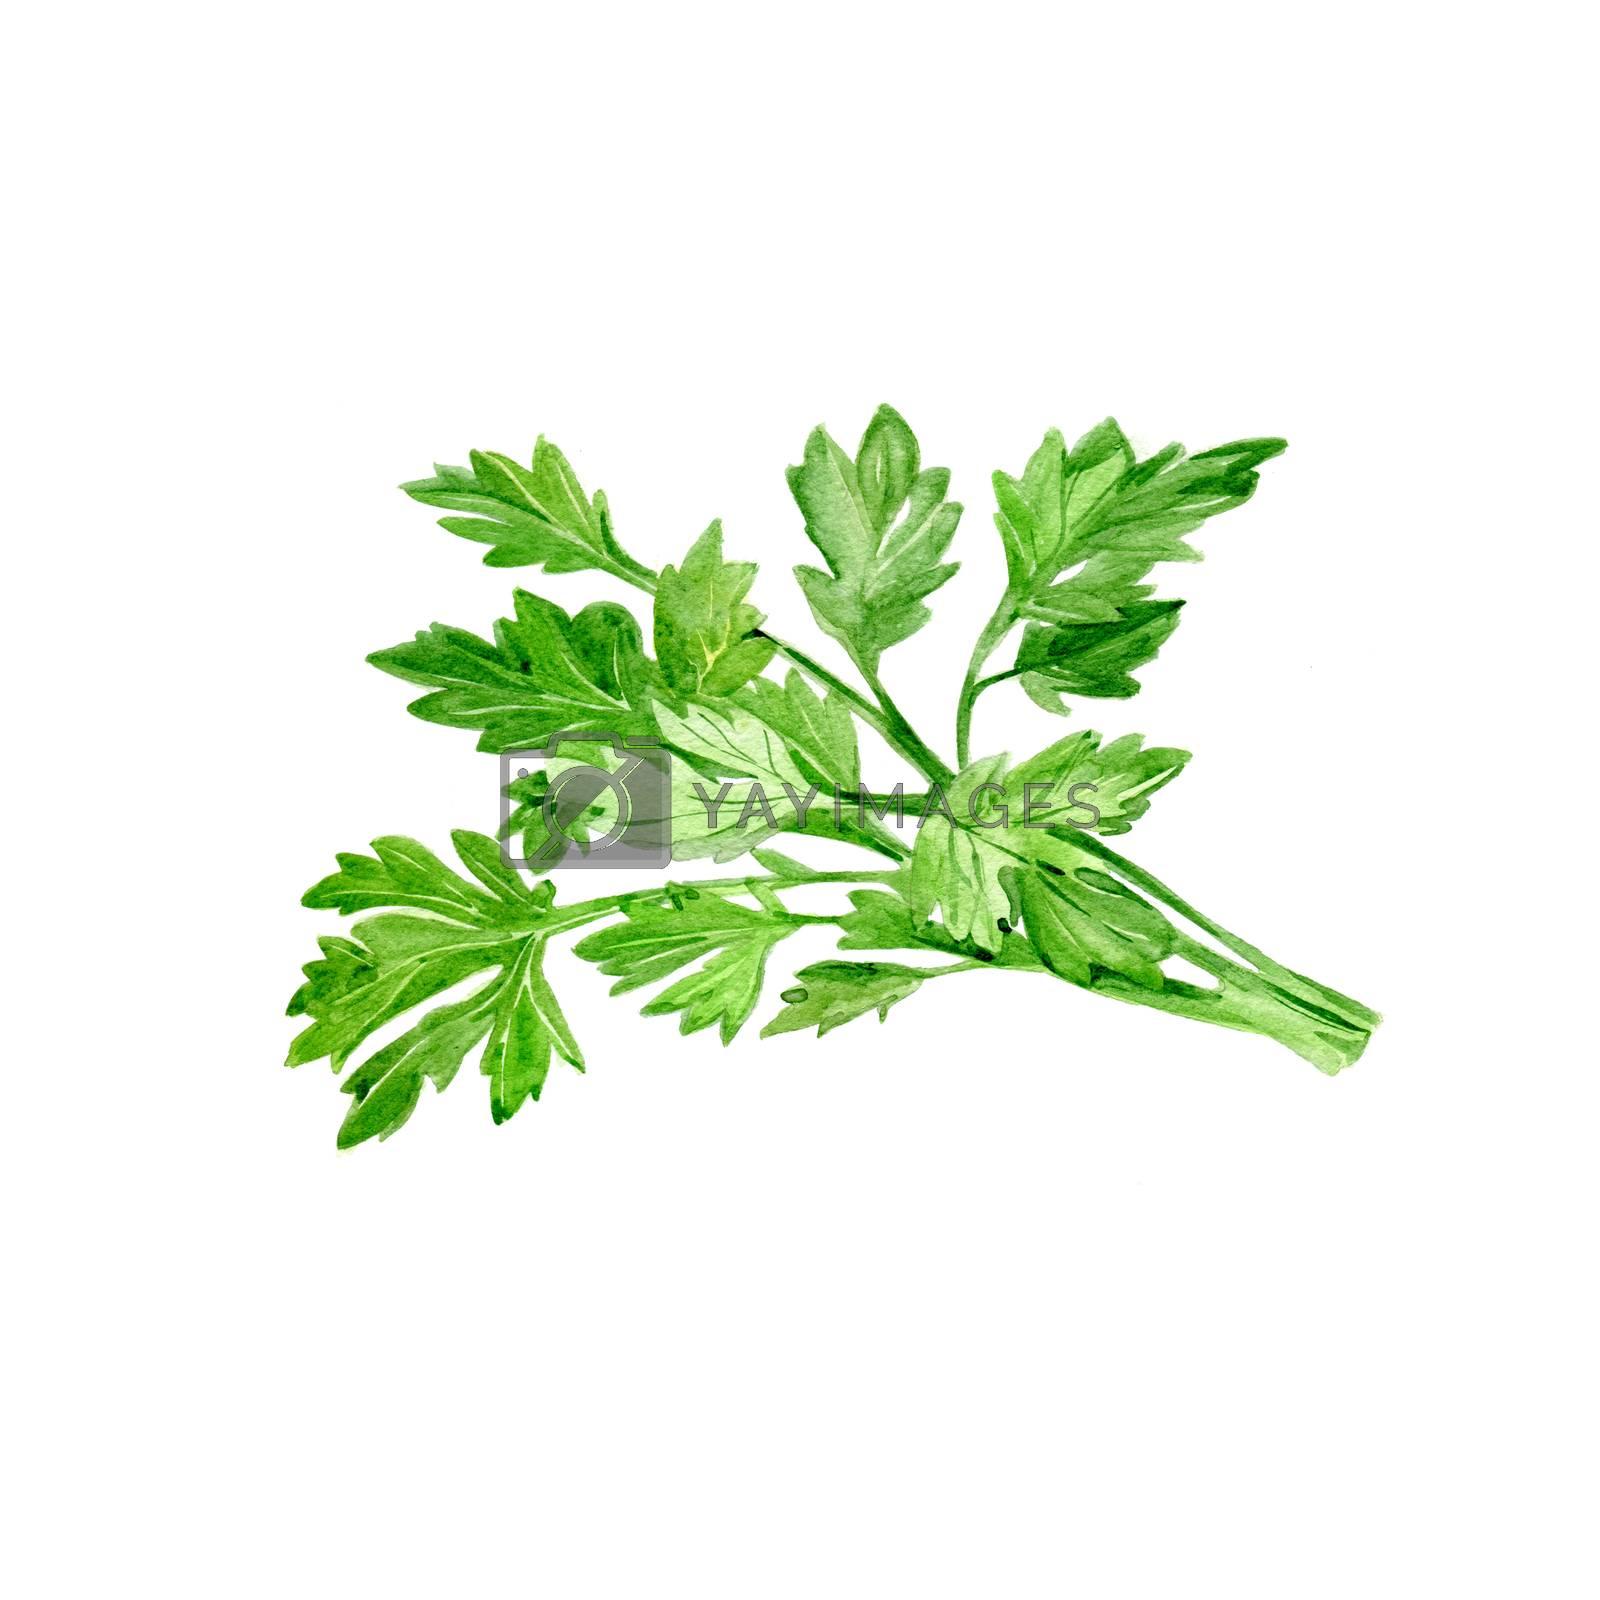 Watercolor Parsley. Hand Drawn Illustration Organic Food Vegetarian Ingredient